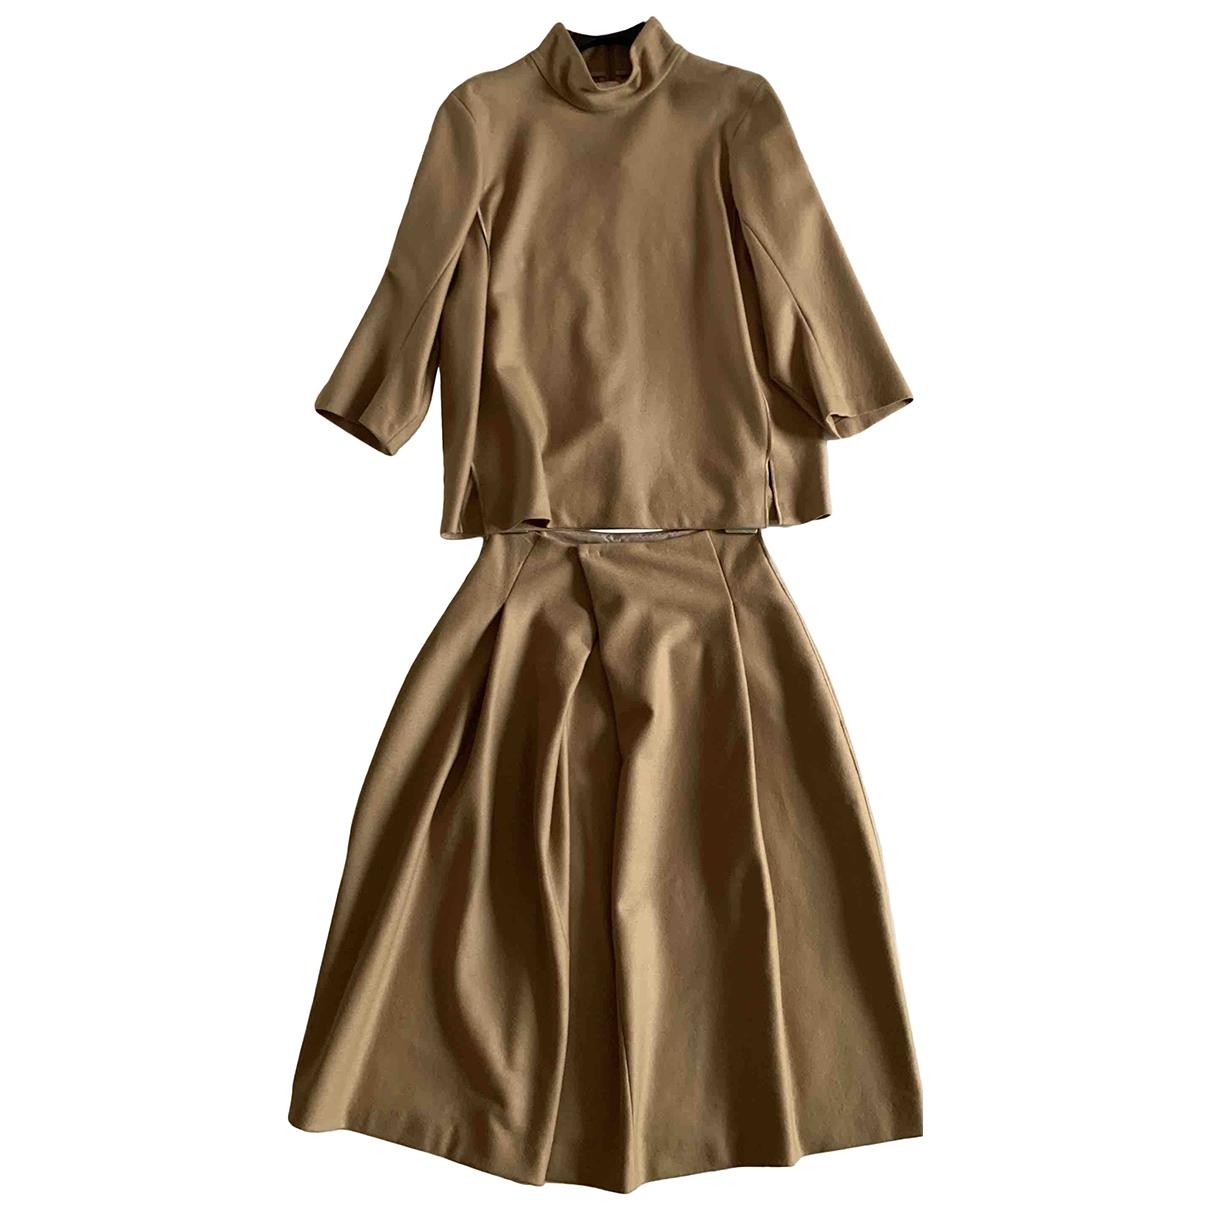 Jil Sander \N Beige Wool skirt for Women 36 FR